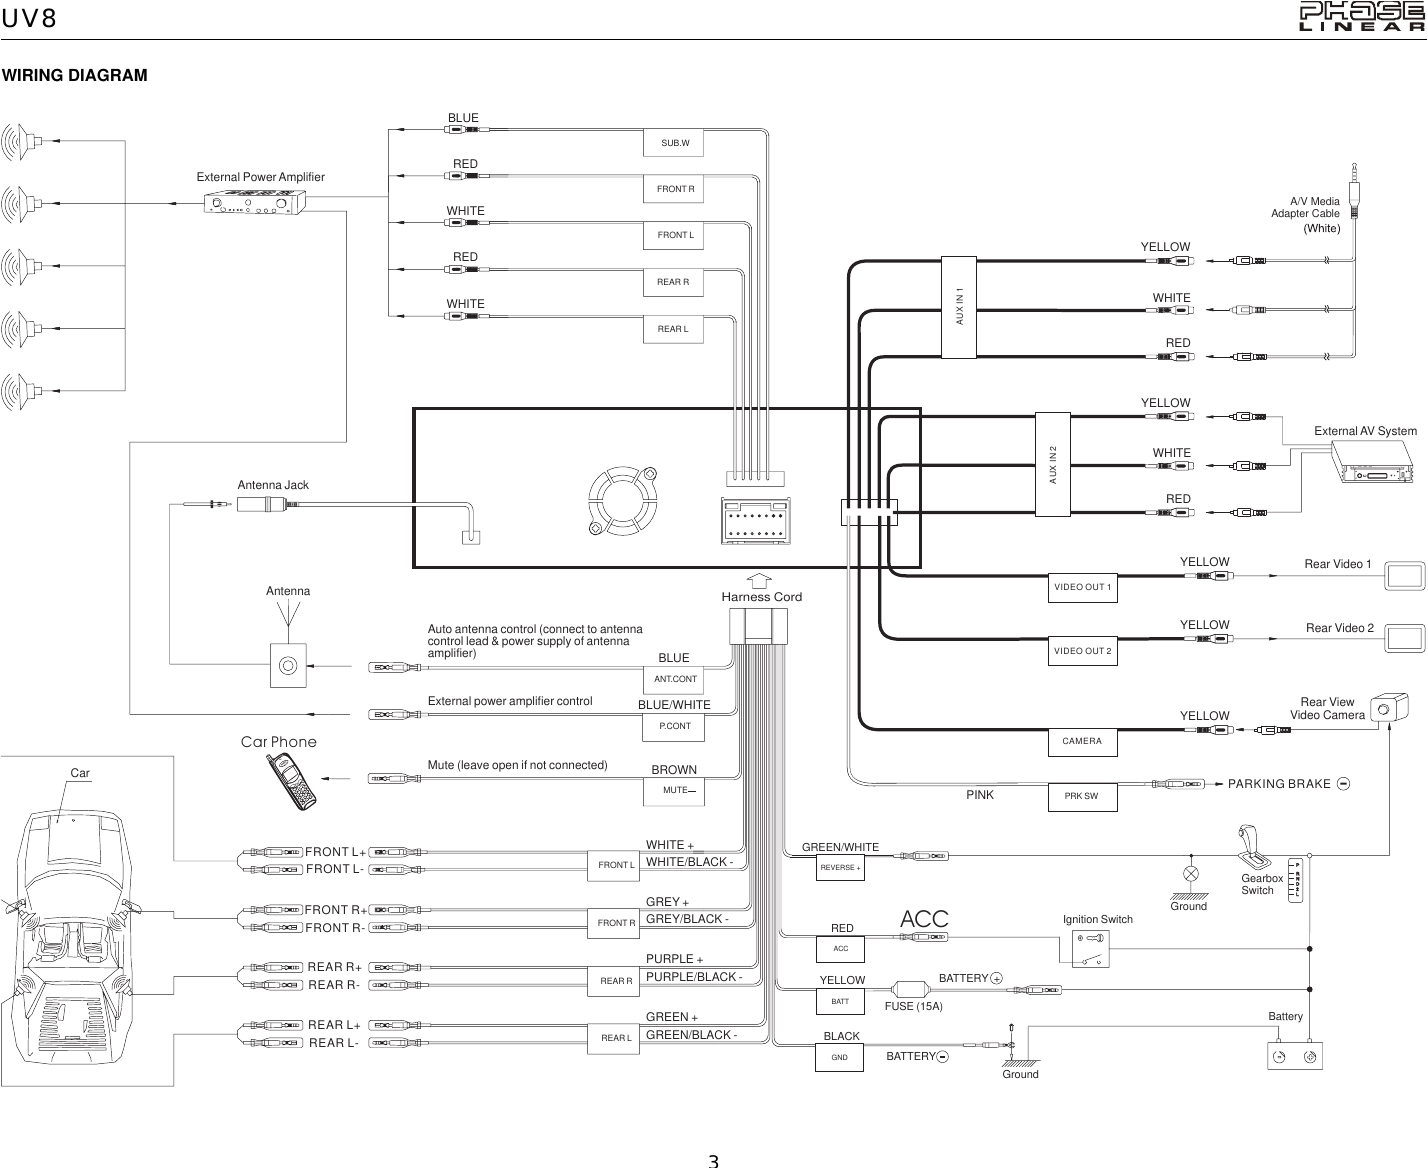 jensen uv8 users manual phase linear uv8 wiring diagram